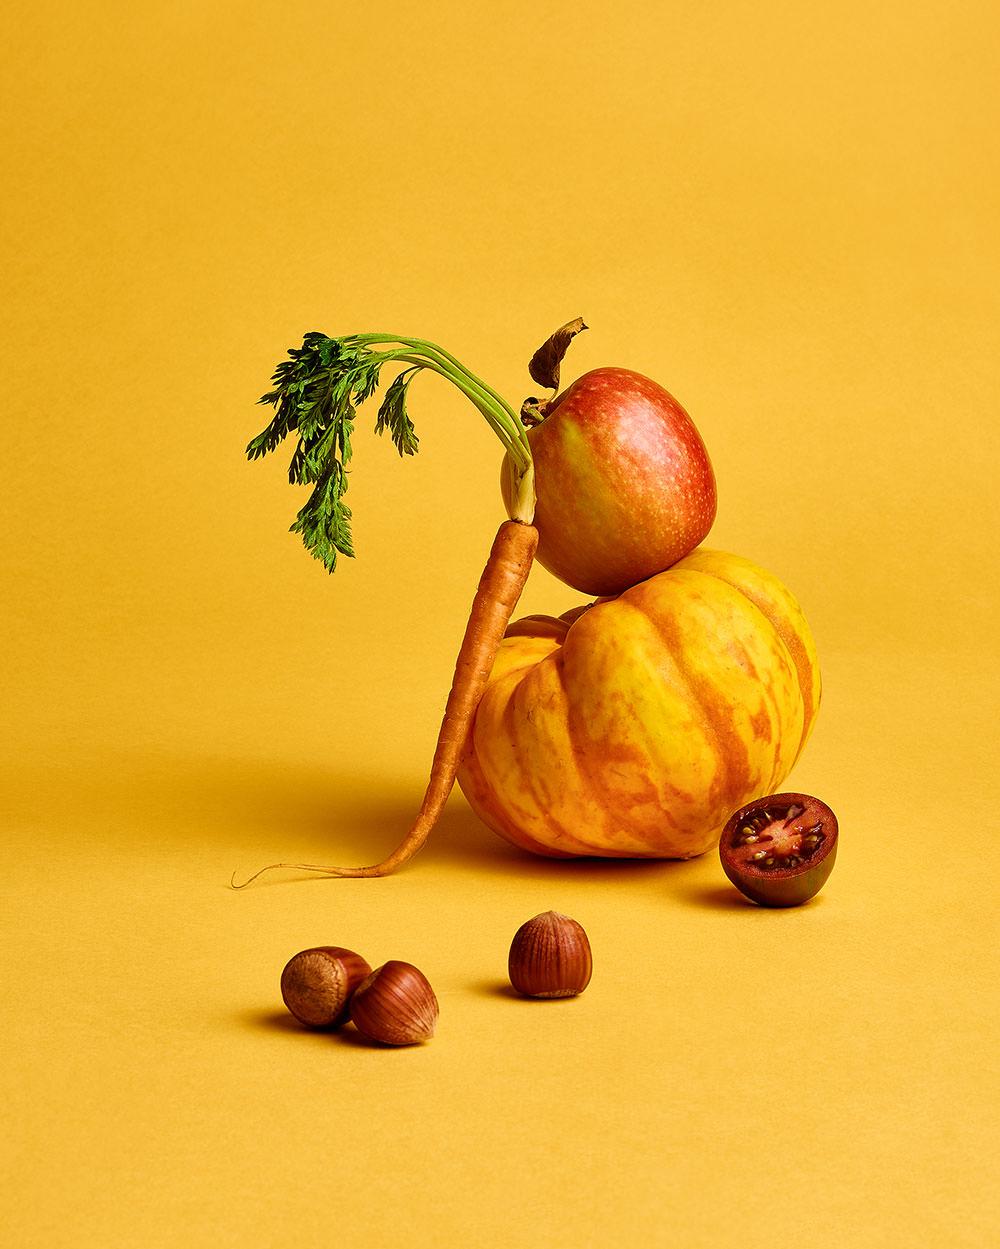 conceptual yellow mixed vegetable still life shot by camilo mateus